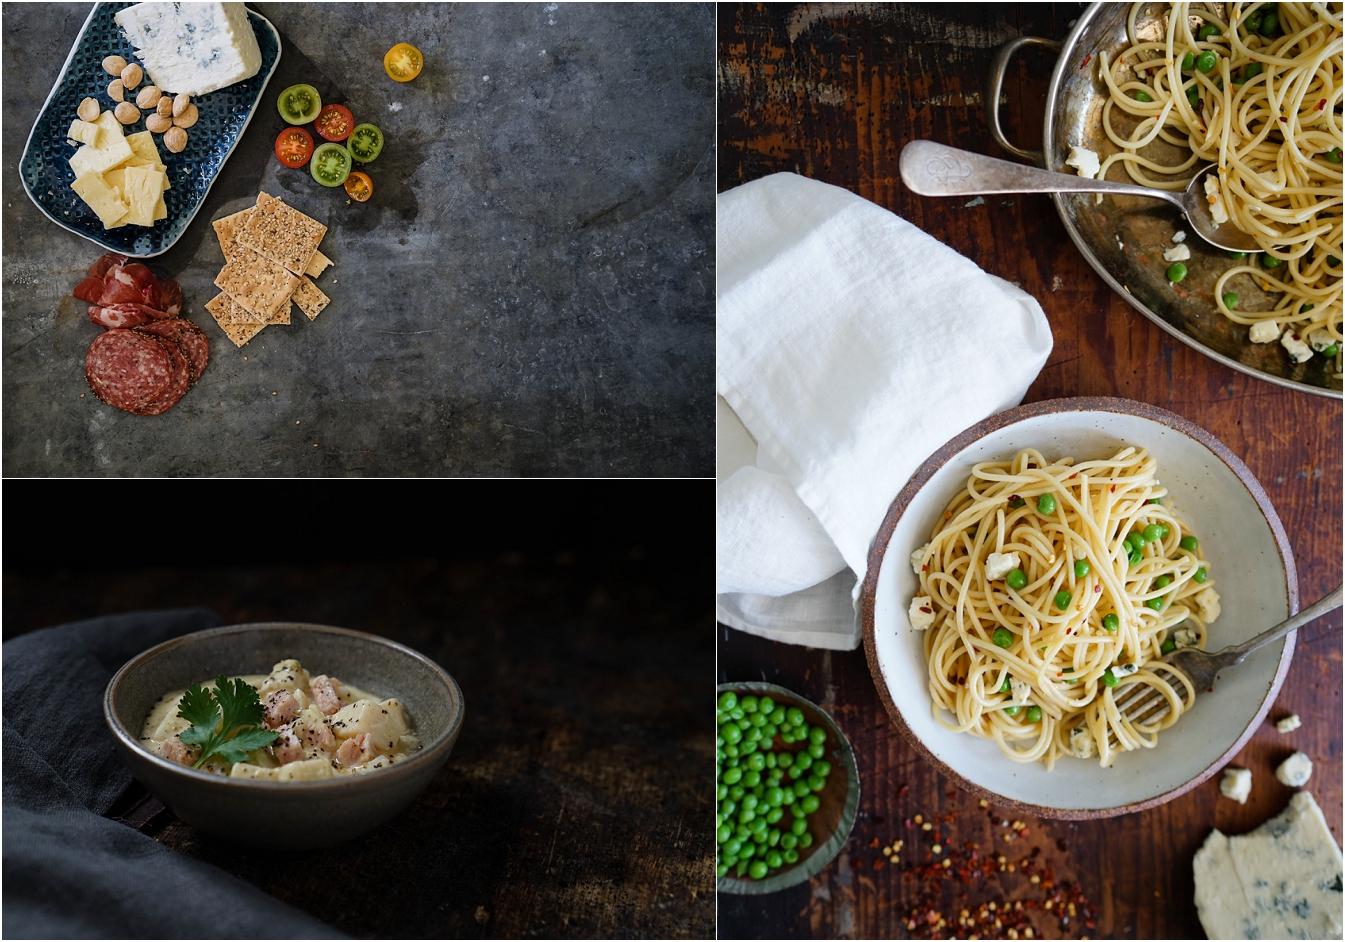 food photography workshop, helene dujardin